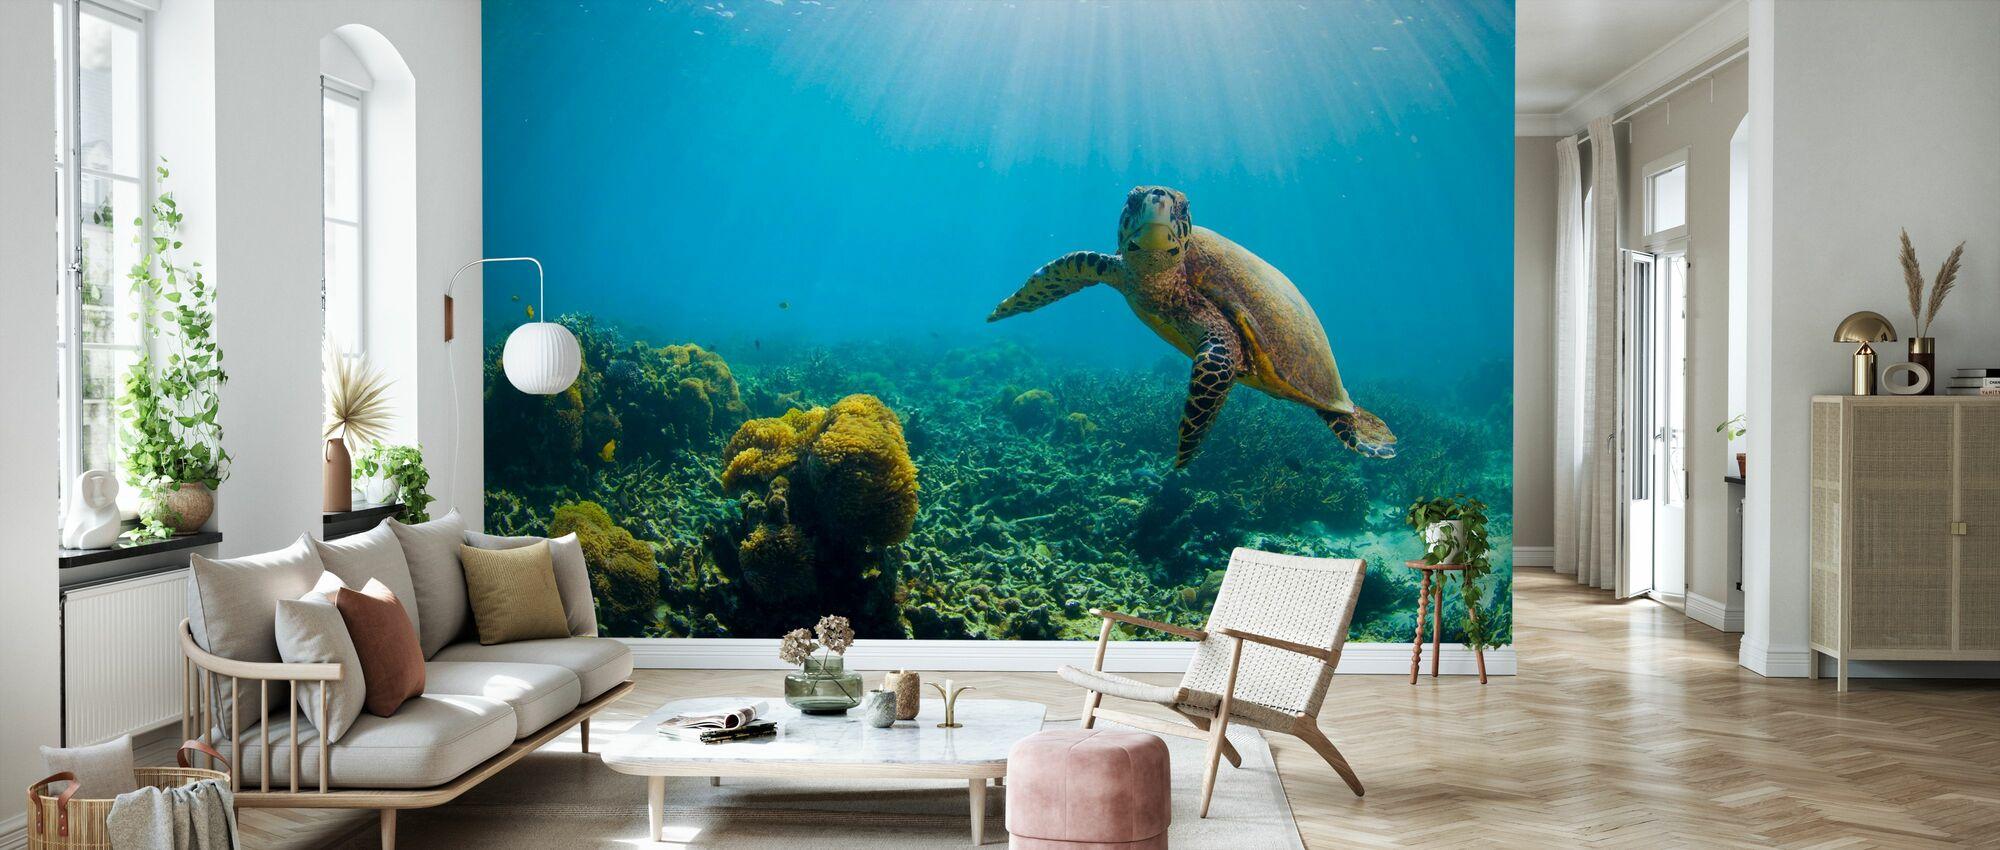 Charming Turtle - Wallpaper - Living Room